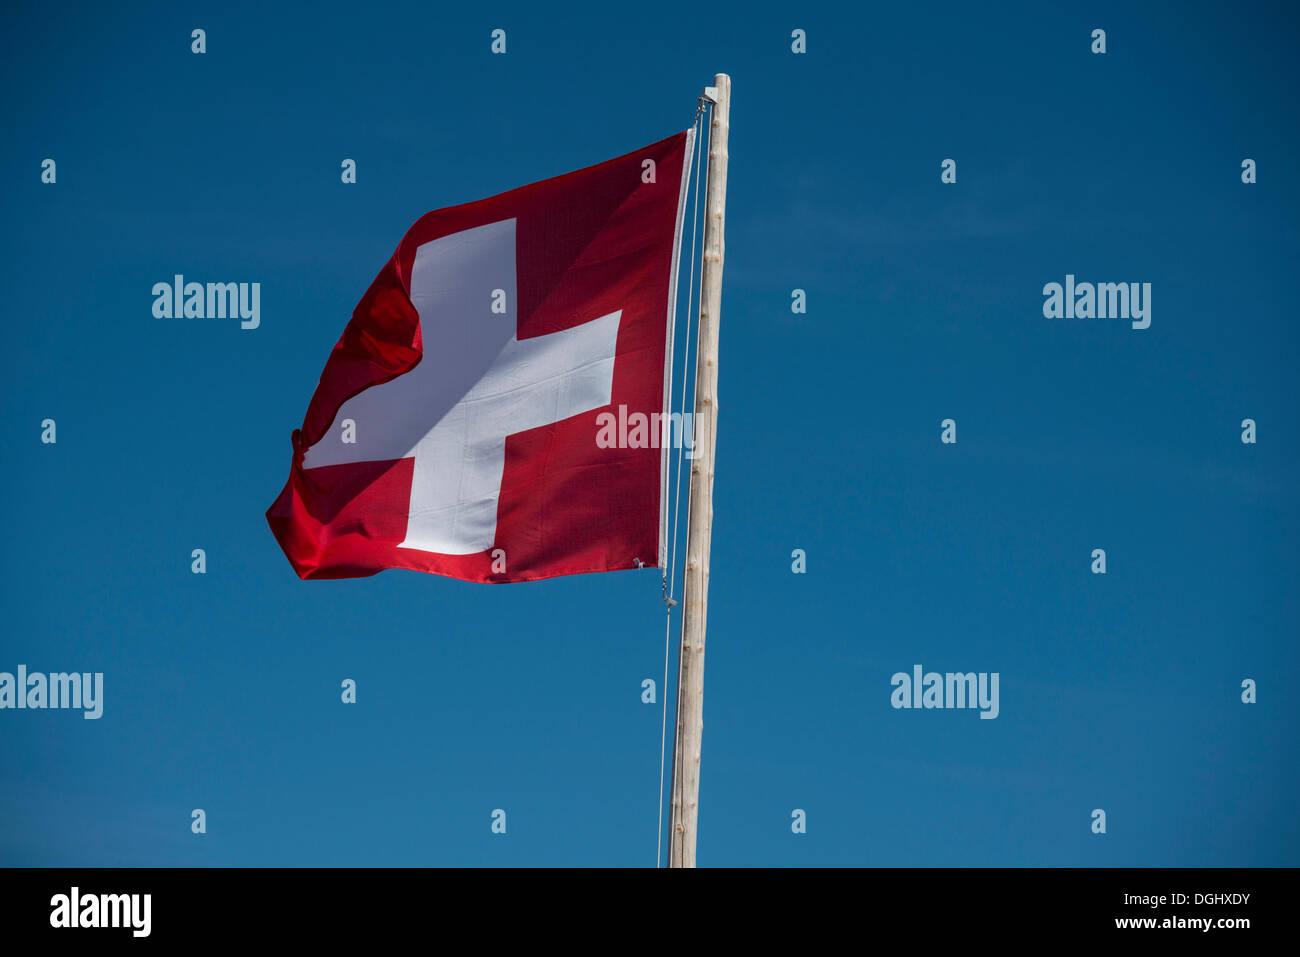 Schweizer Flagge, Säntis, Sänti, Kanton Appenzell Ausserrhoden, Schweiz Stockbild